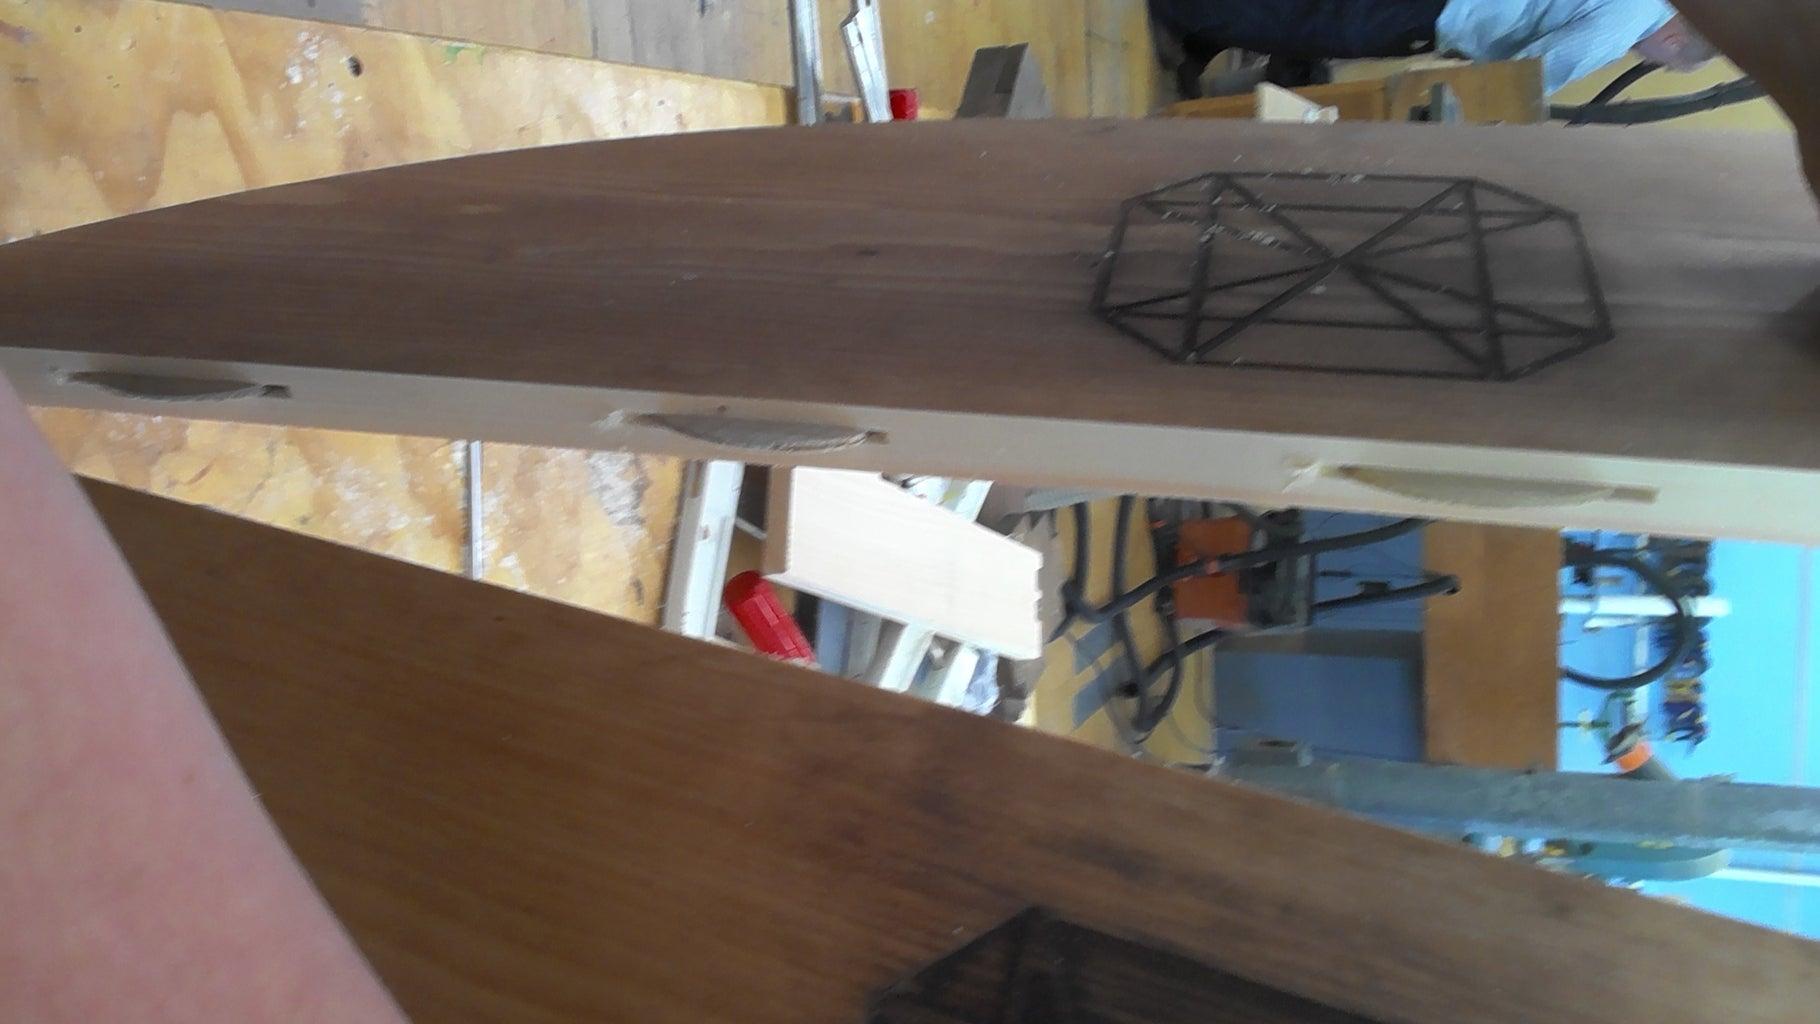 Gluing the Board